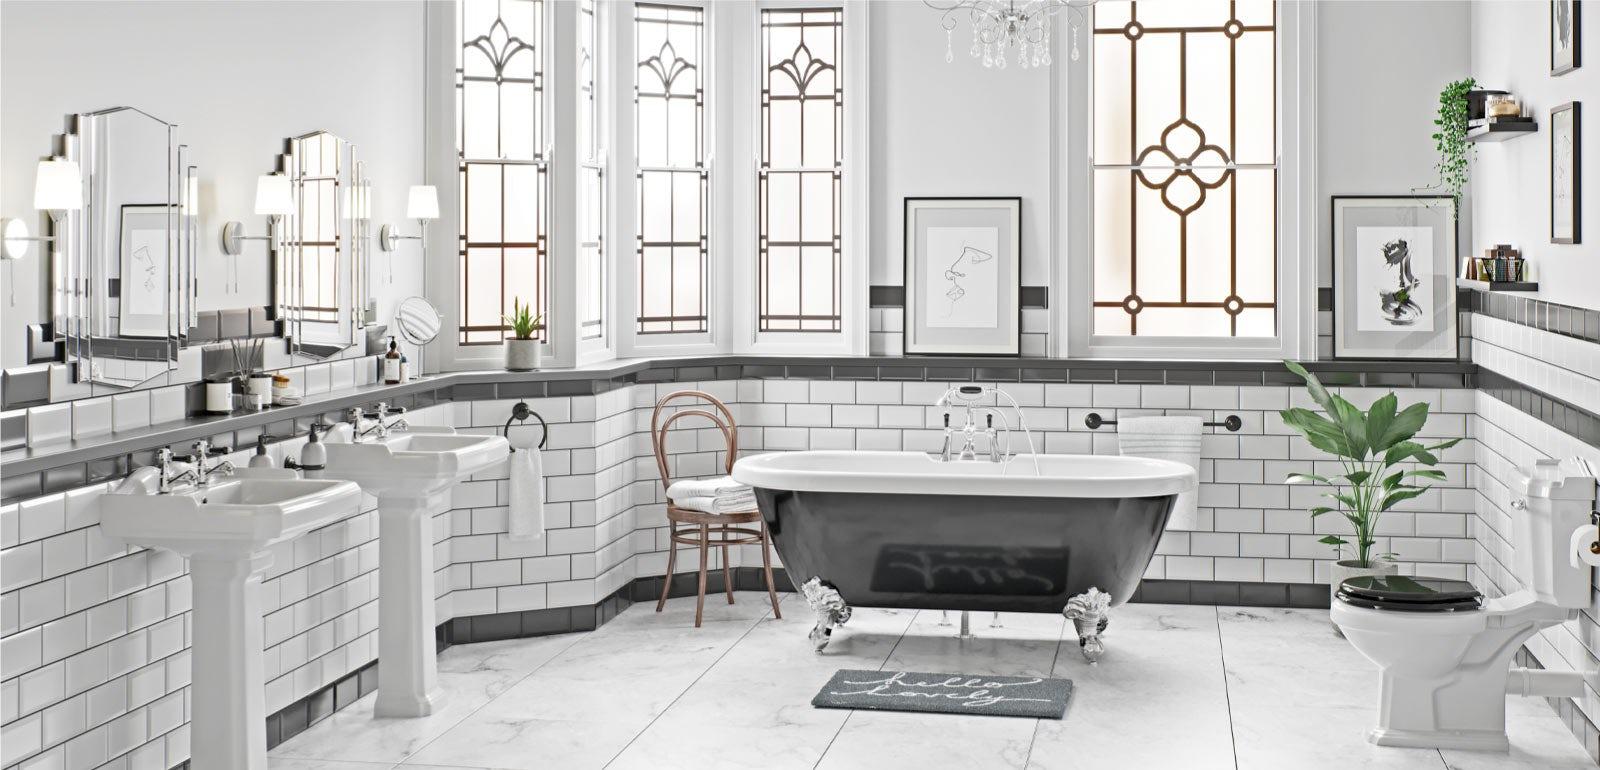 Chrome Finish Art Deco Countertop